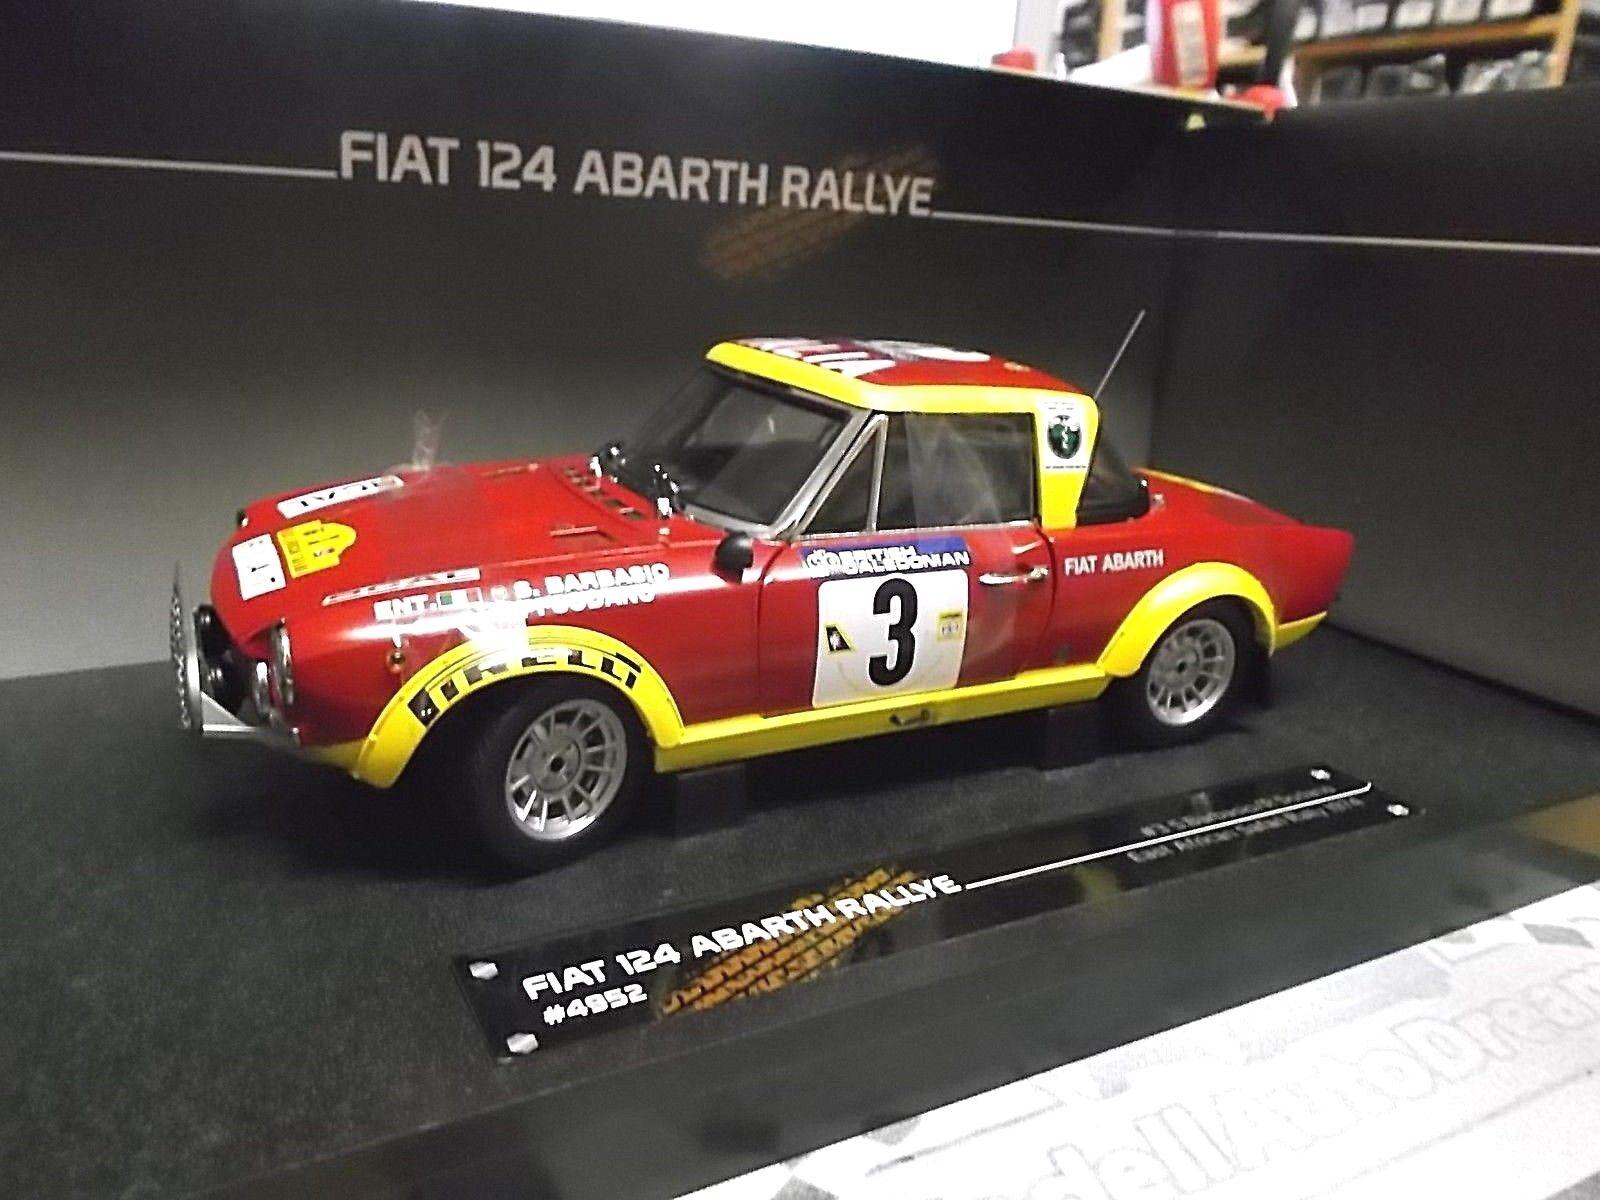 Fiat 124 abarth - rallye - afrikanischen safari   3 1974 barbasio sodano sunstar sst 1,18